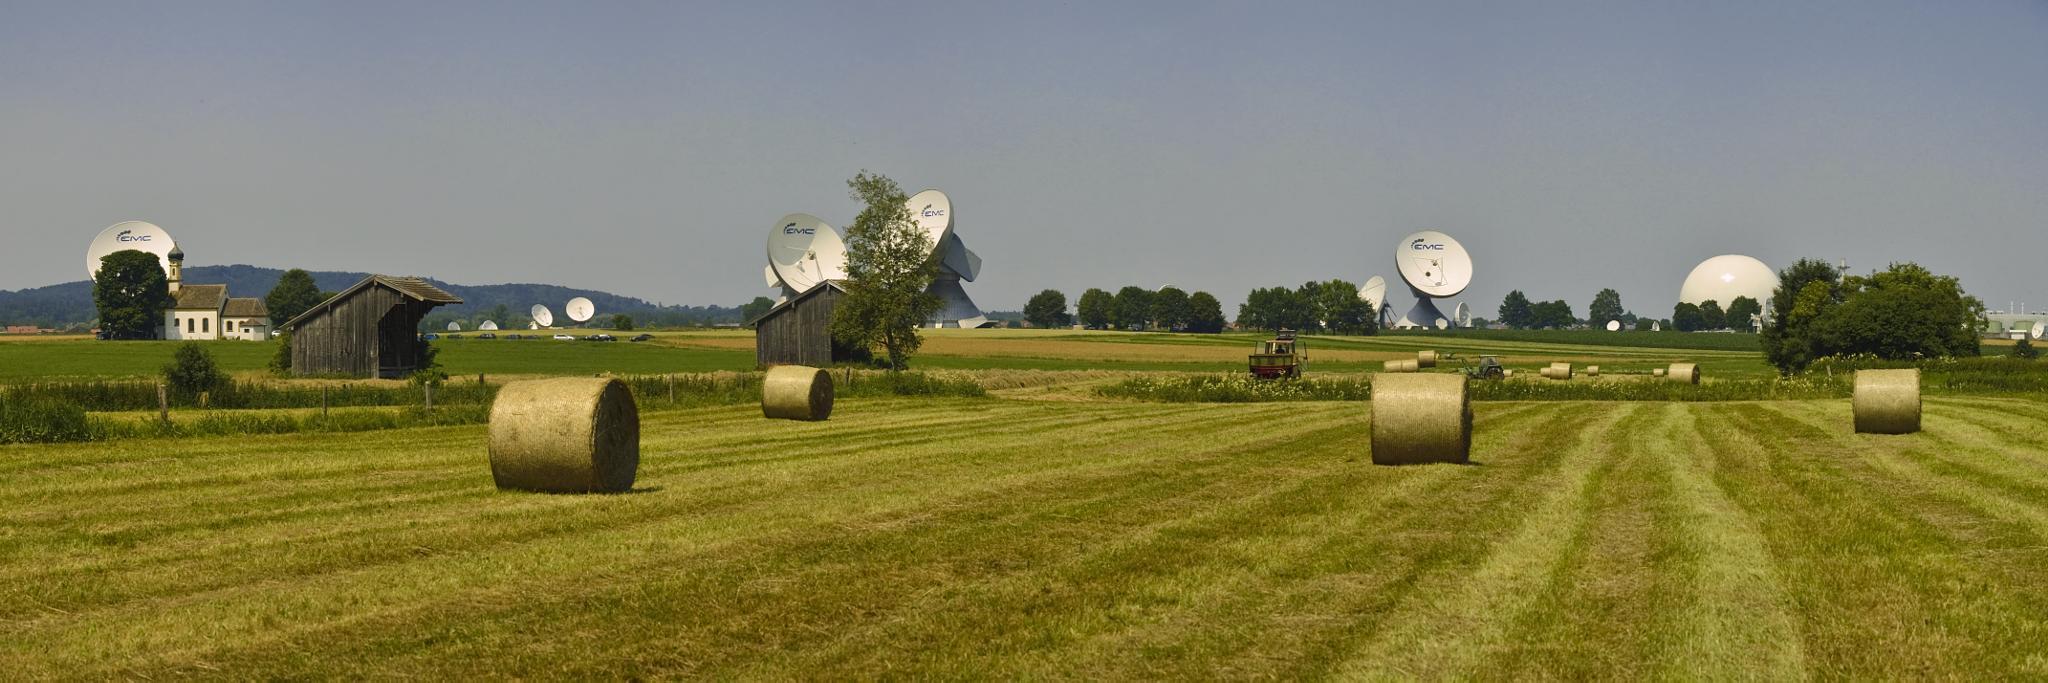 Hay harvest! by ben.wendler.1